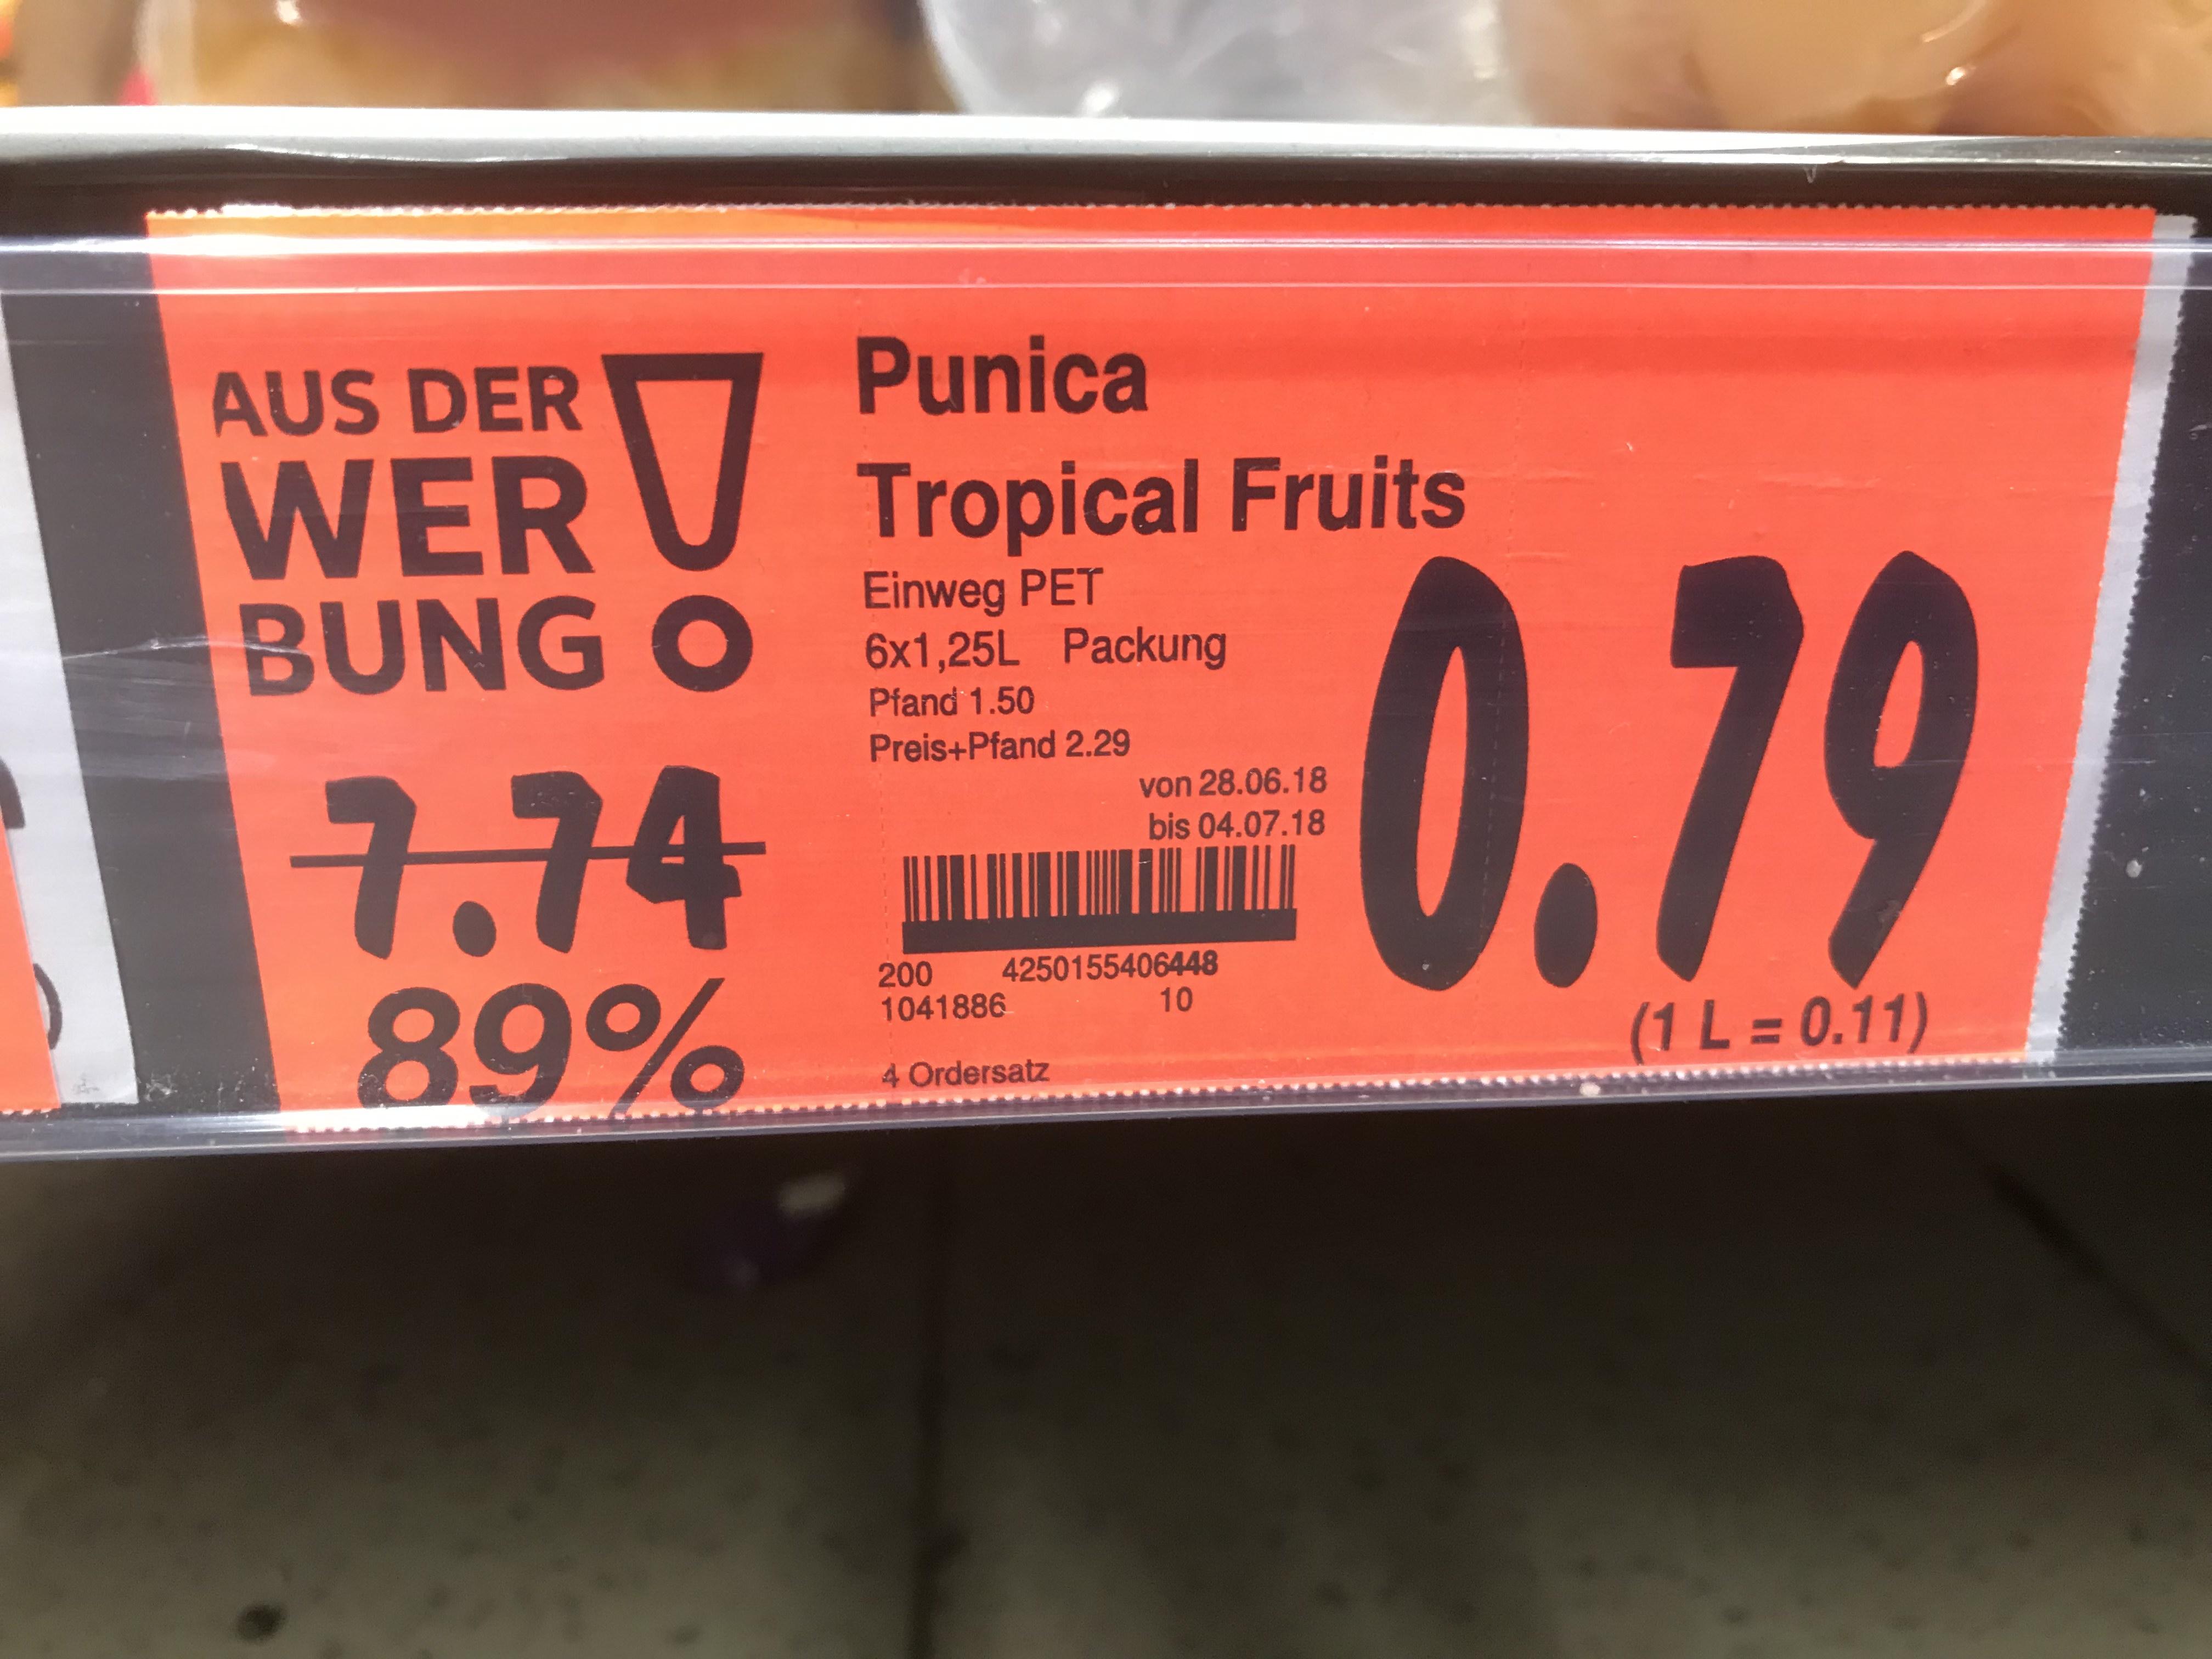 (Kaufland Rüsselsheim) 6 x 1,25 L Punics € 0,79 (89 % reduziert)